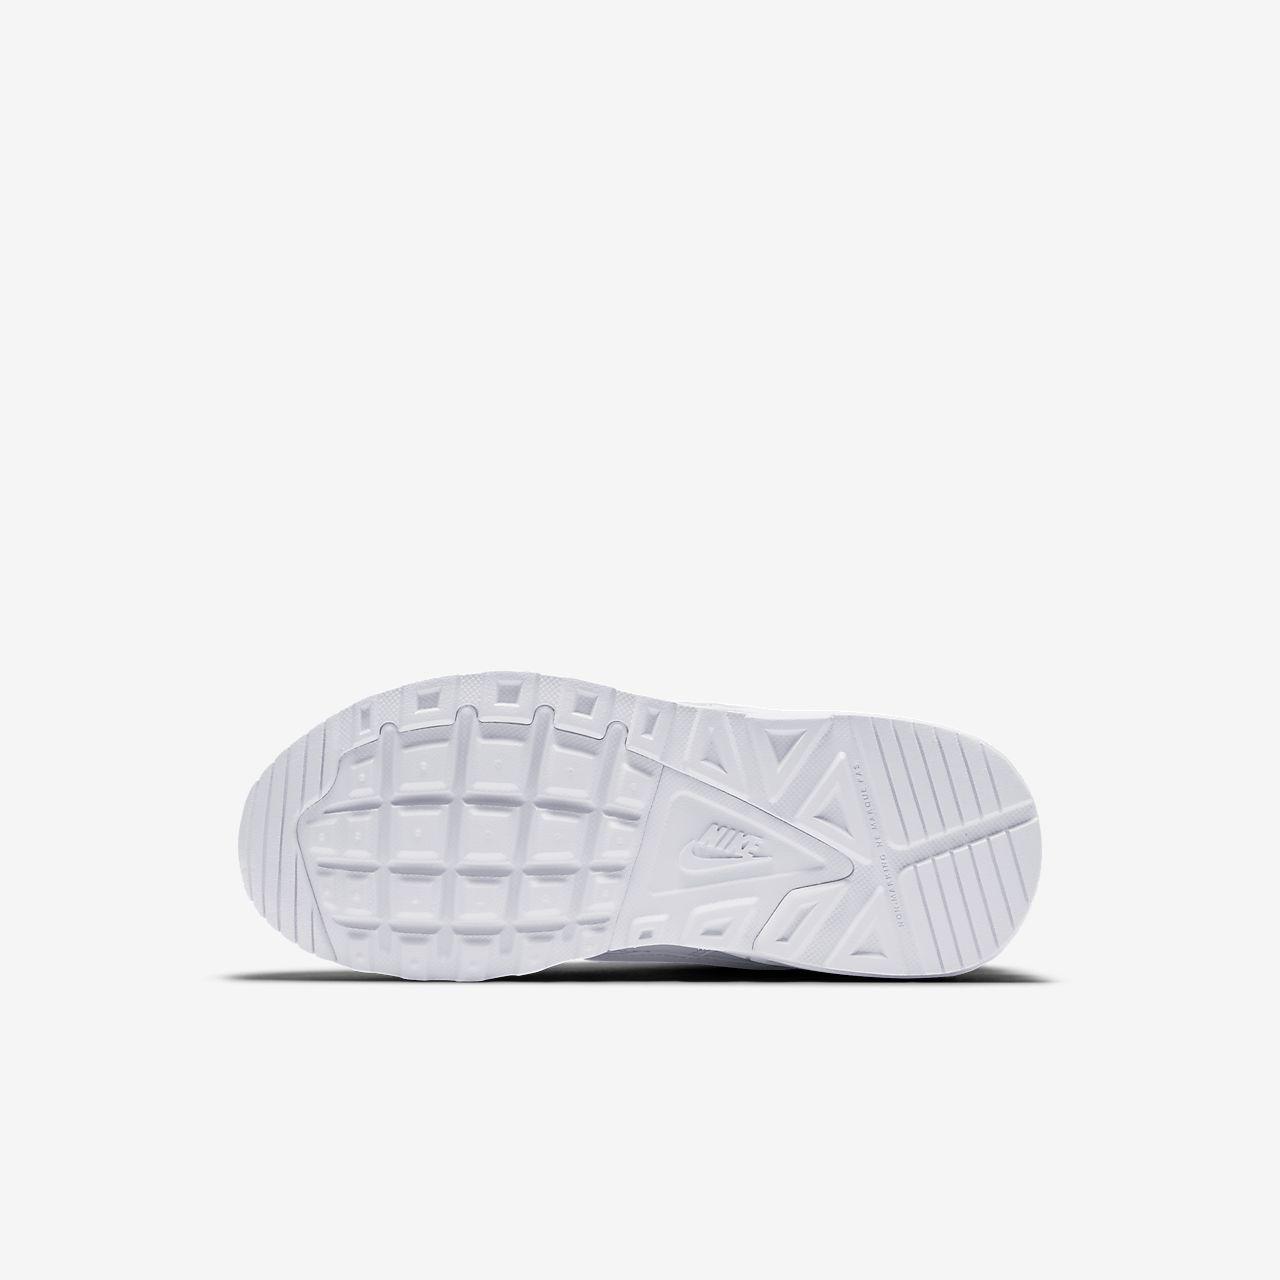 5d7de19988 Nike Air Max Command Flex Younger Kids' Shoe. Nike.com IE